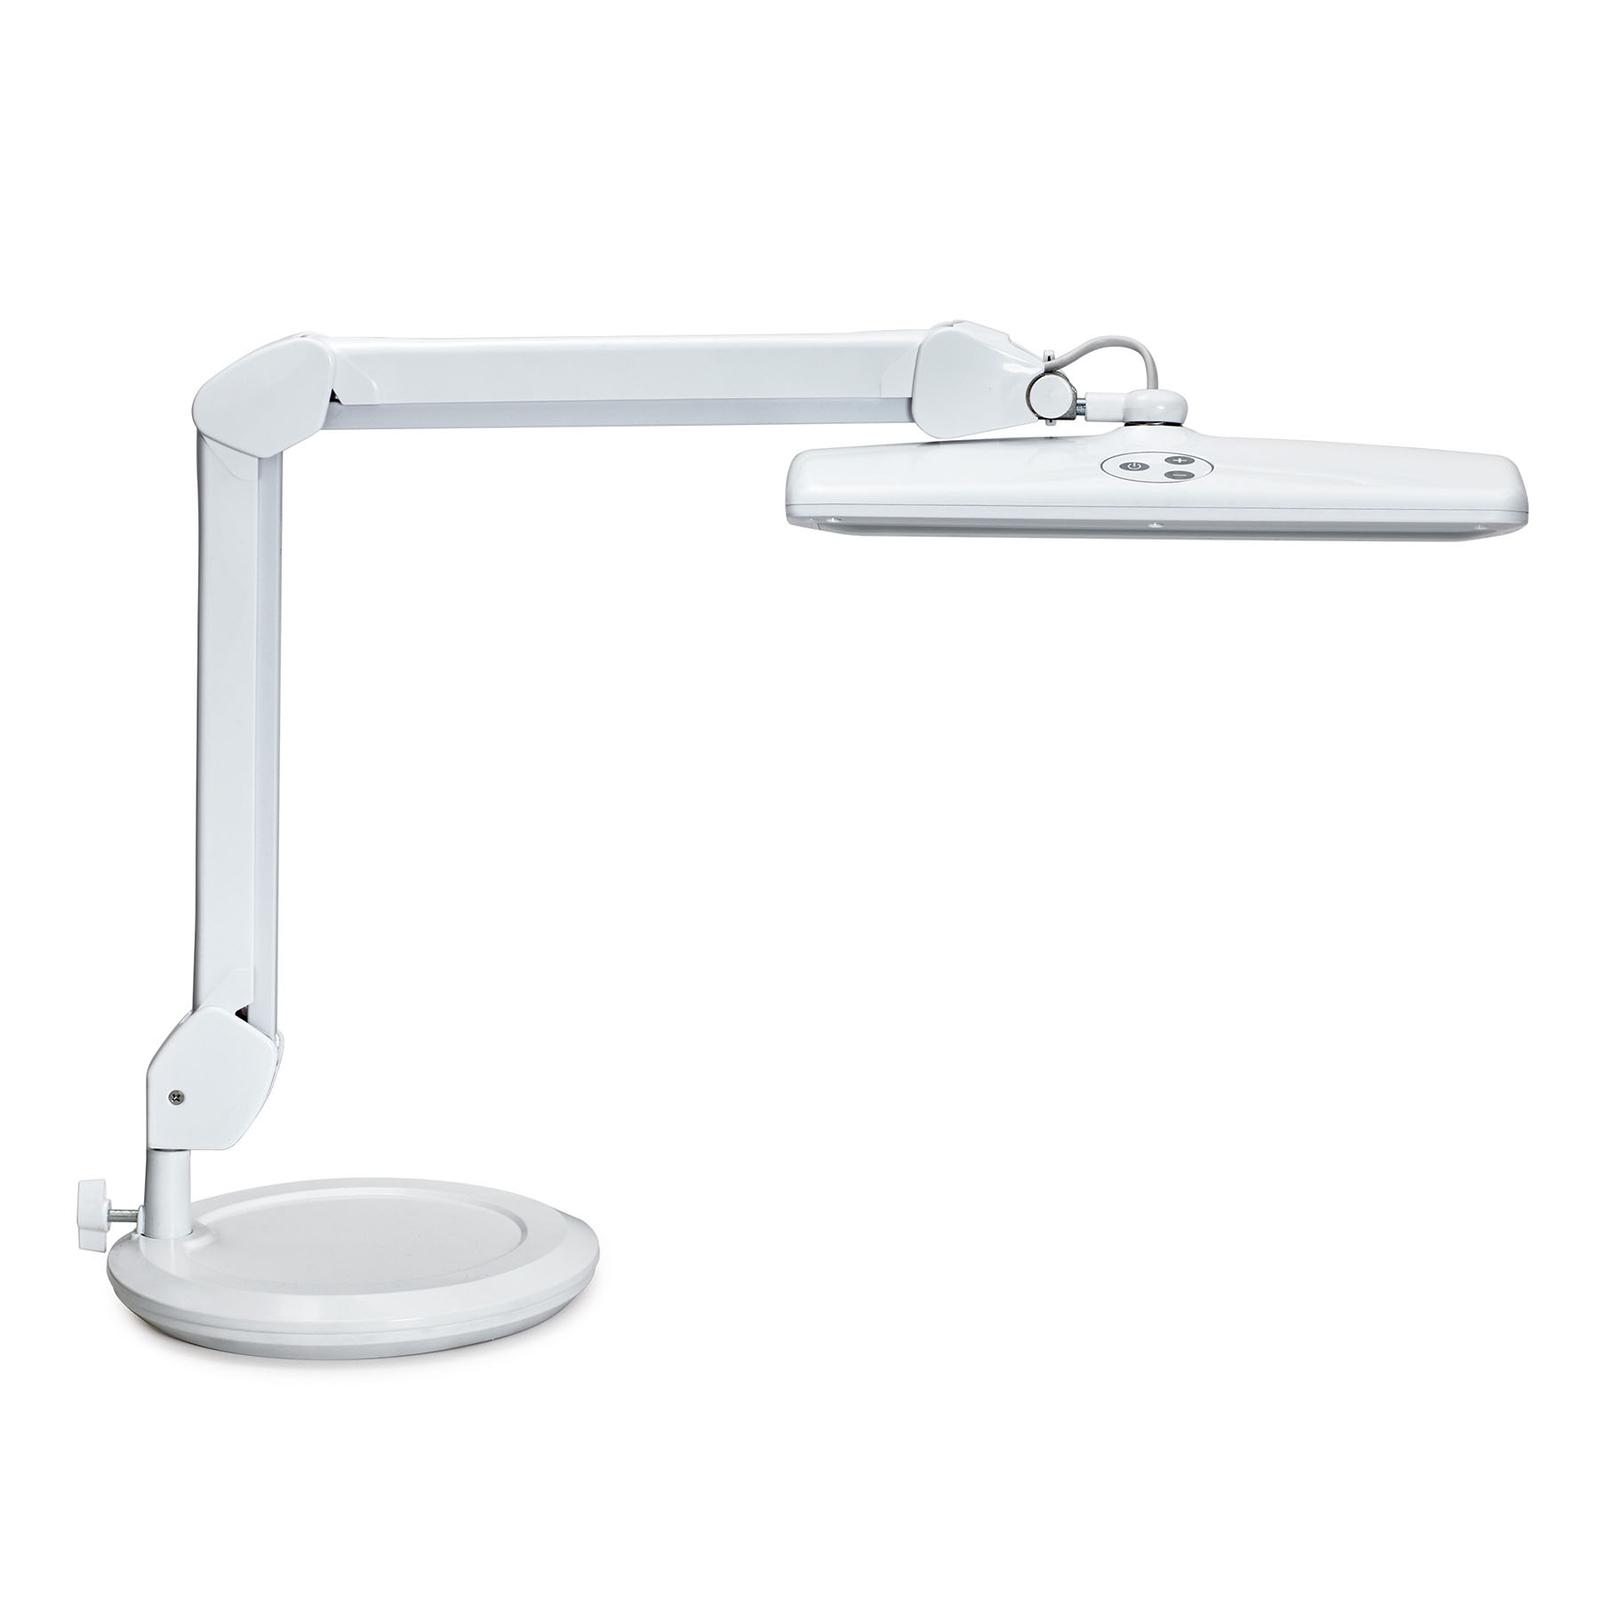 LED-Arbeitsplatzleuchte MAULintro mit Standfuß